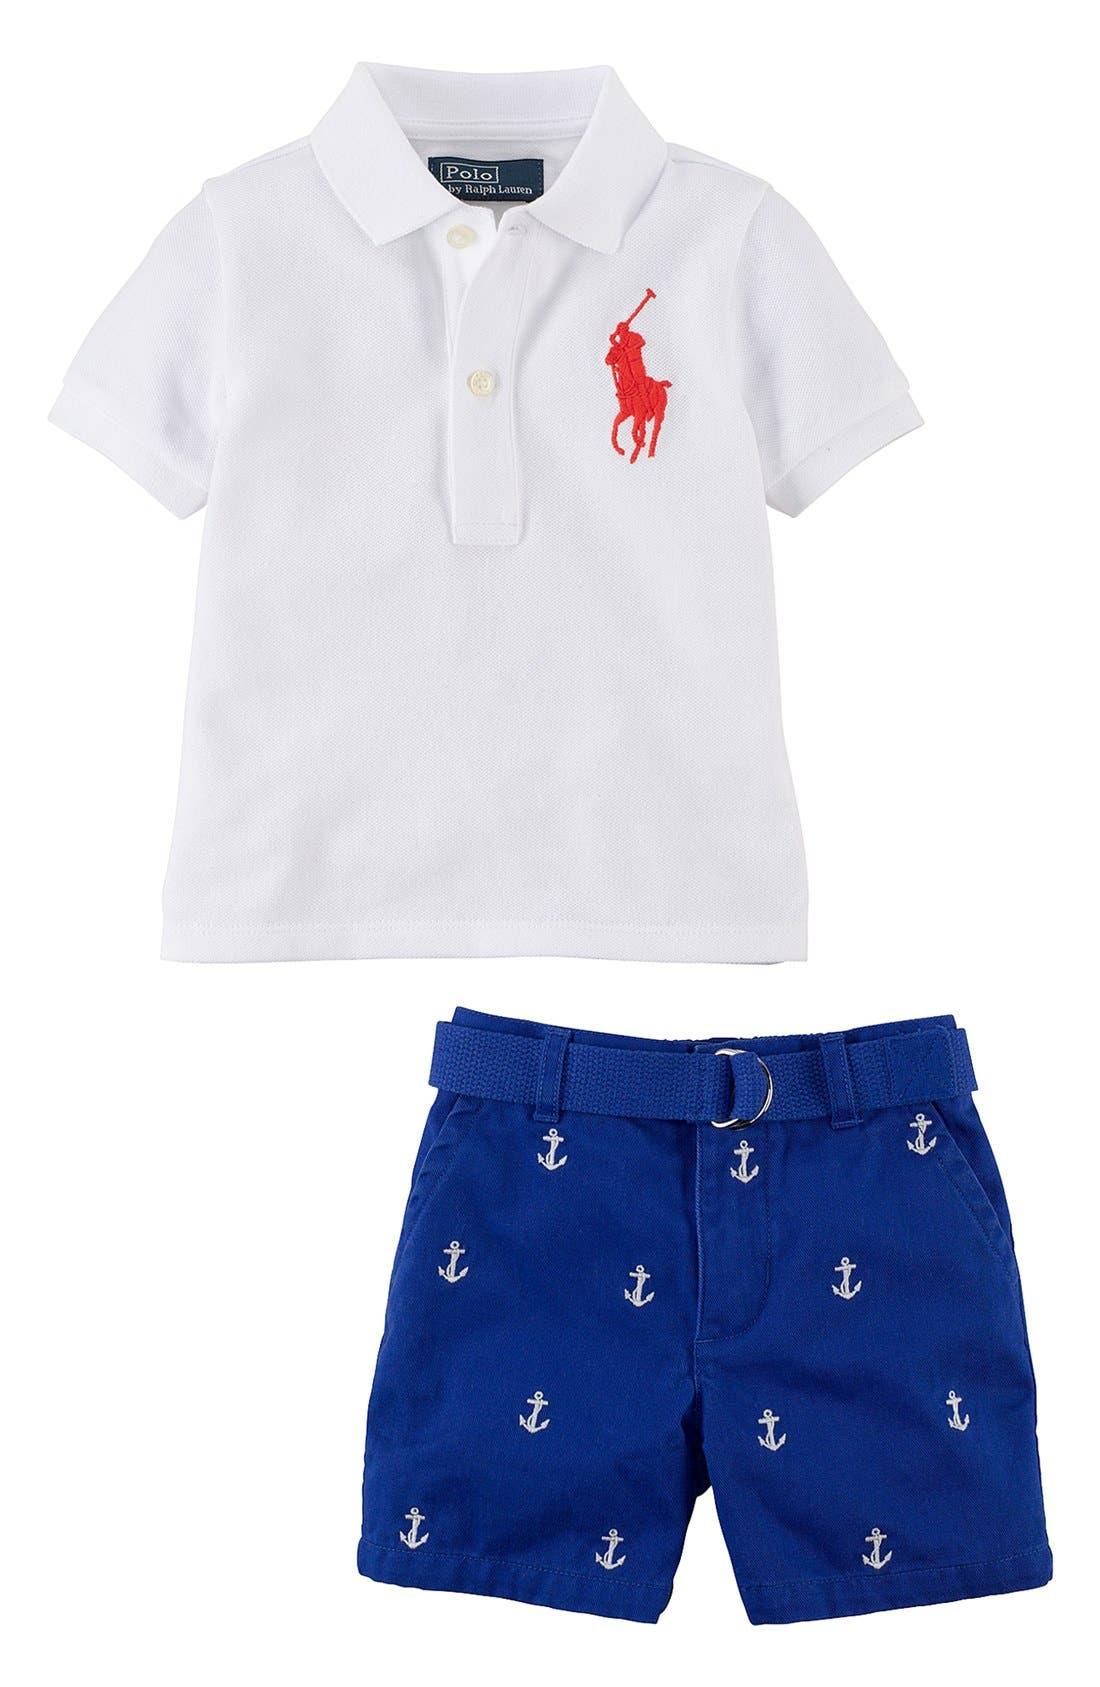 Main Image - Ralph Lauren Polo & Shorts (Baby Boys)